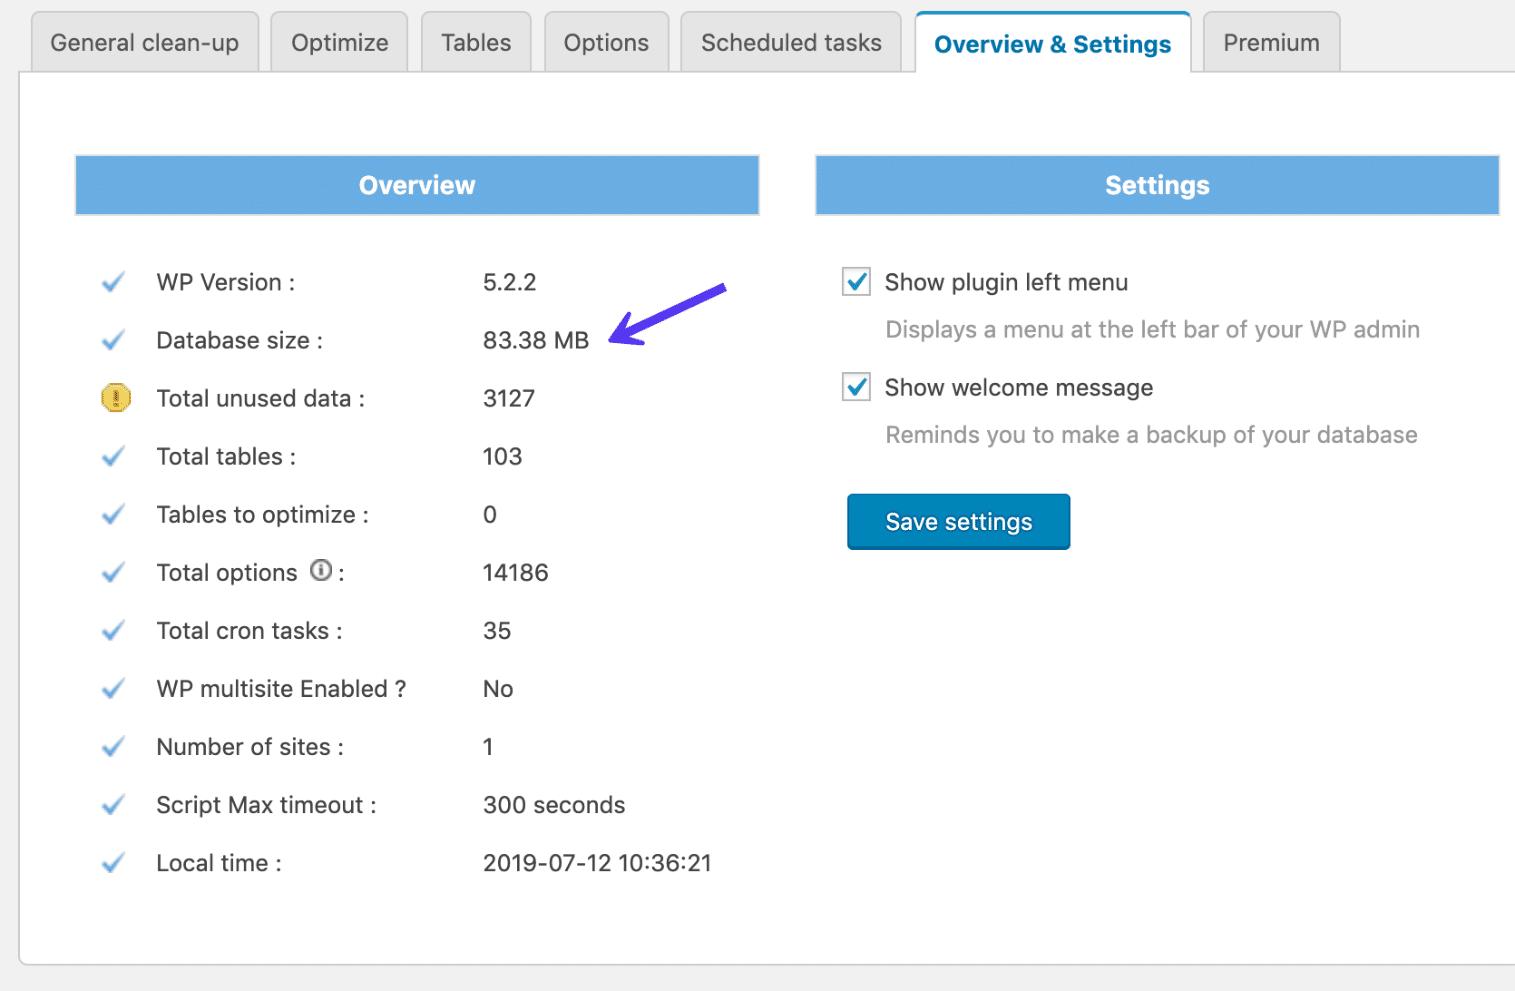 Gesamte Datenbankgröße im Plugin